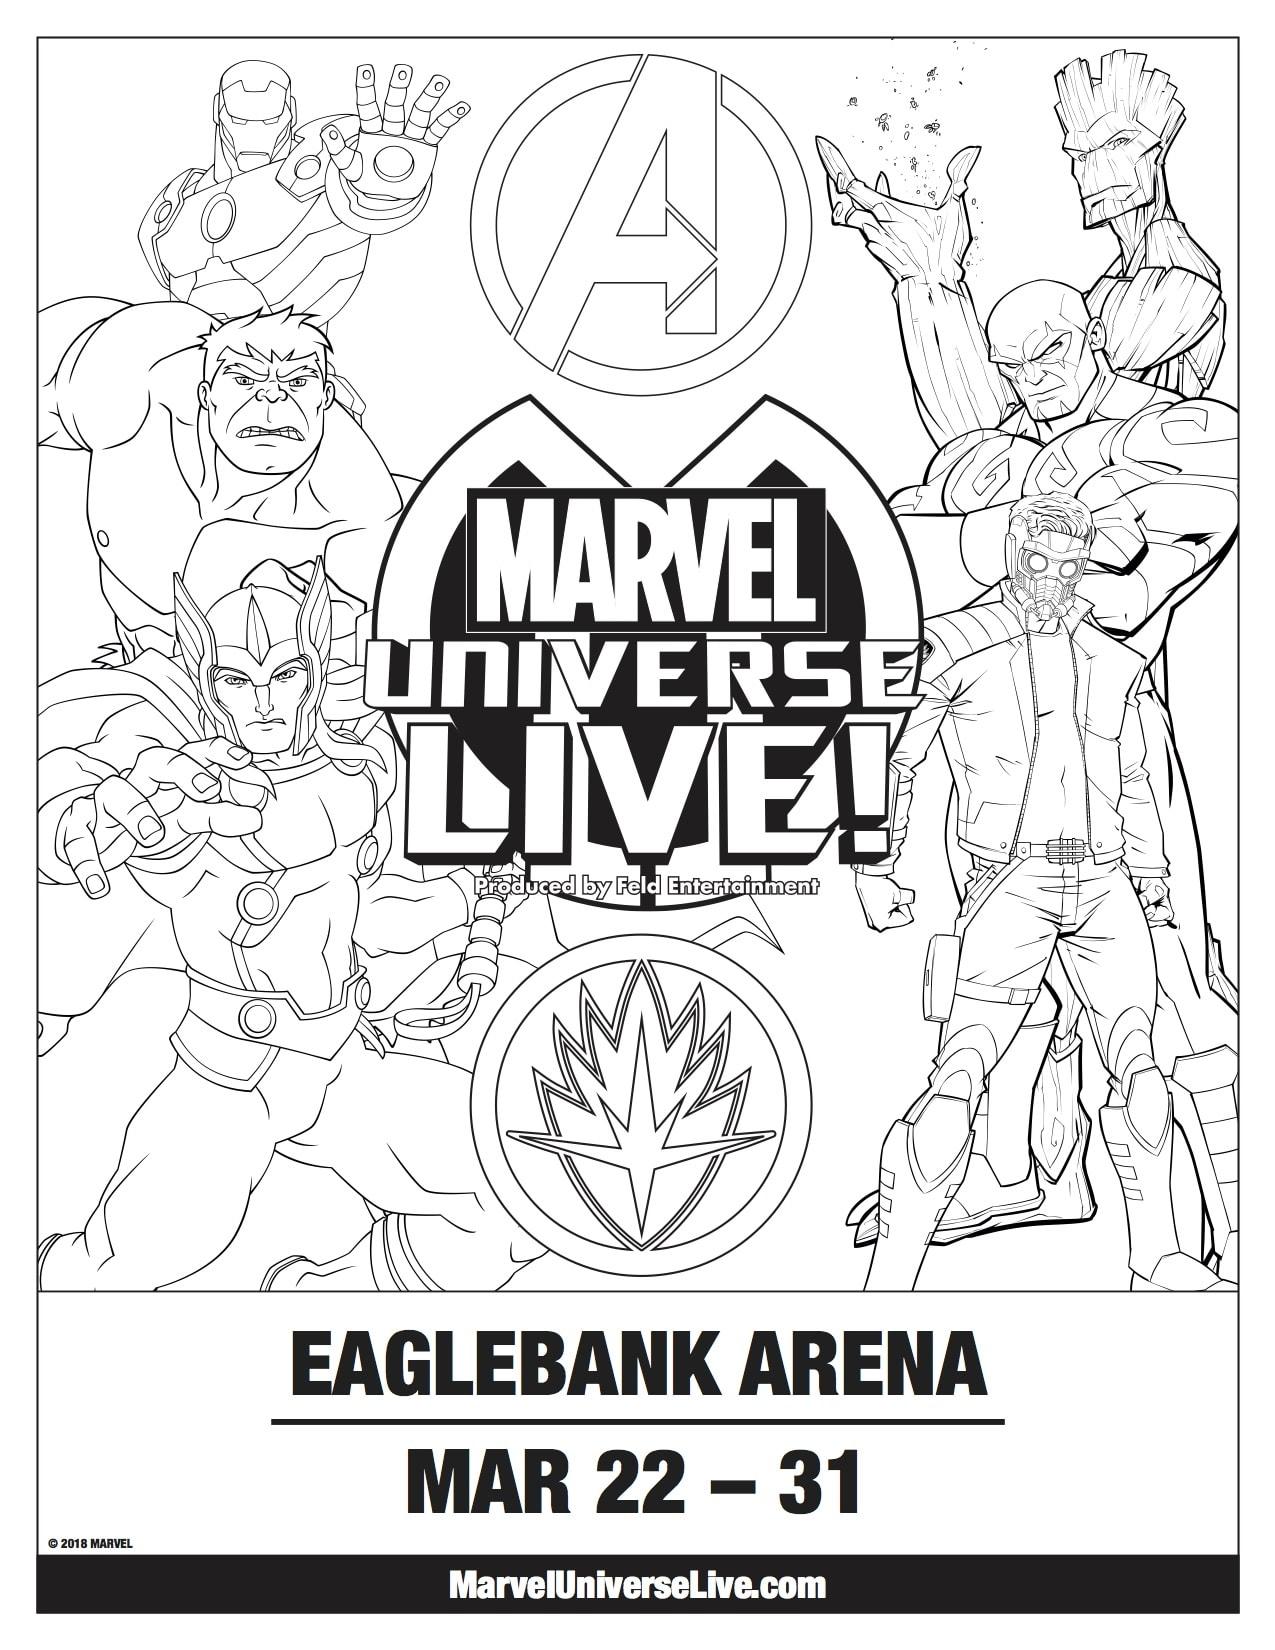 Marvel Universe LIVE Coloring Sheet